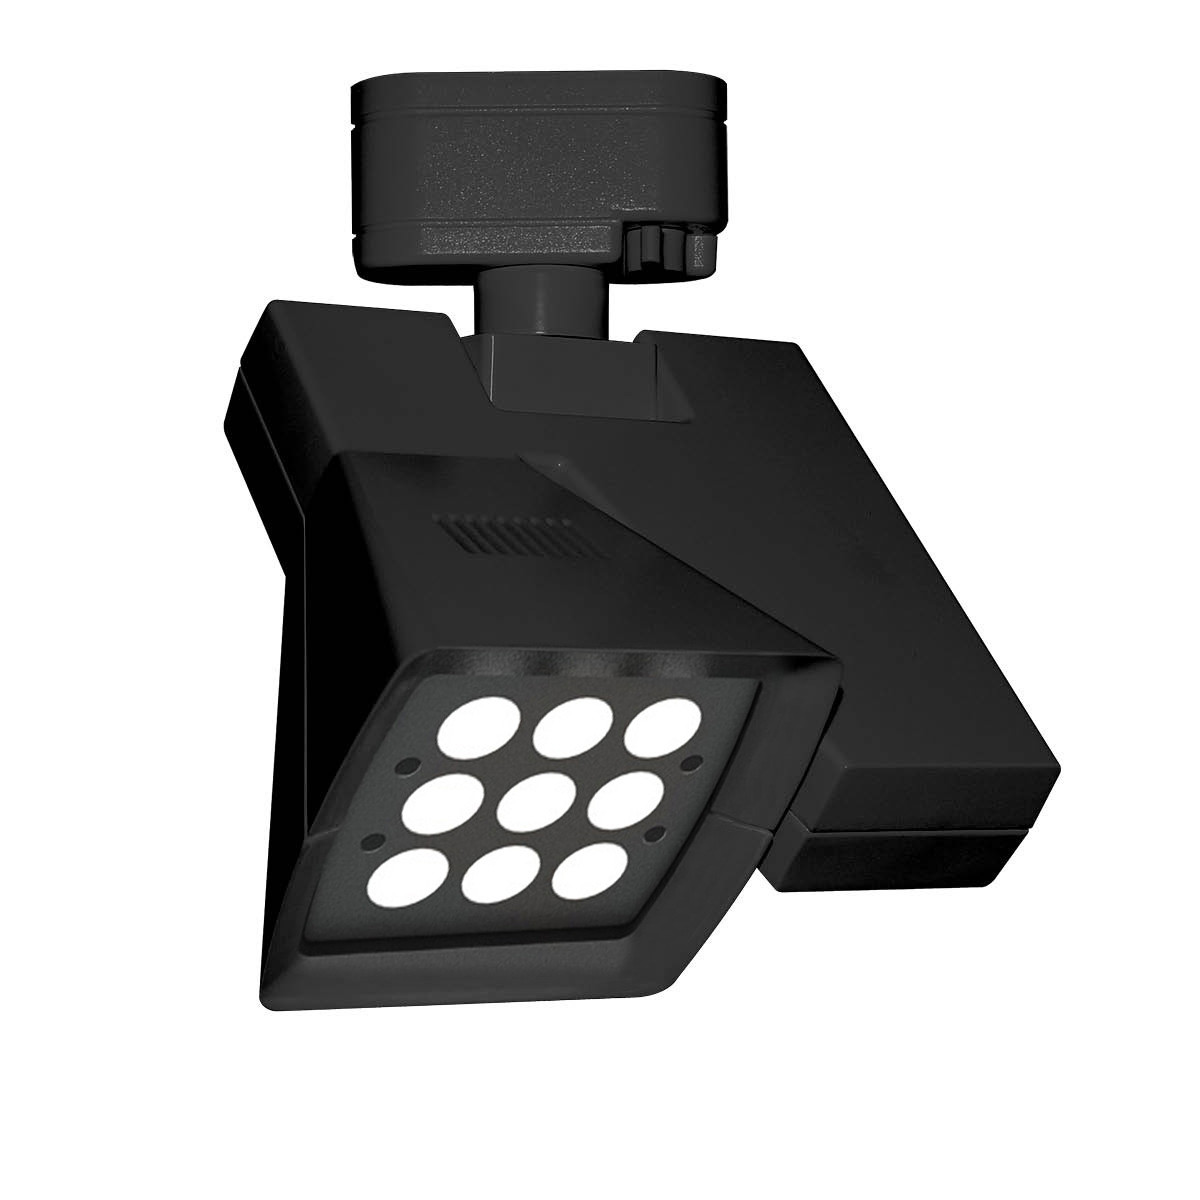 2700K Flood WAC Lighting WTK-LED25F-27-WT 25W Argos LEDme Track Head for 120V W Track